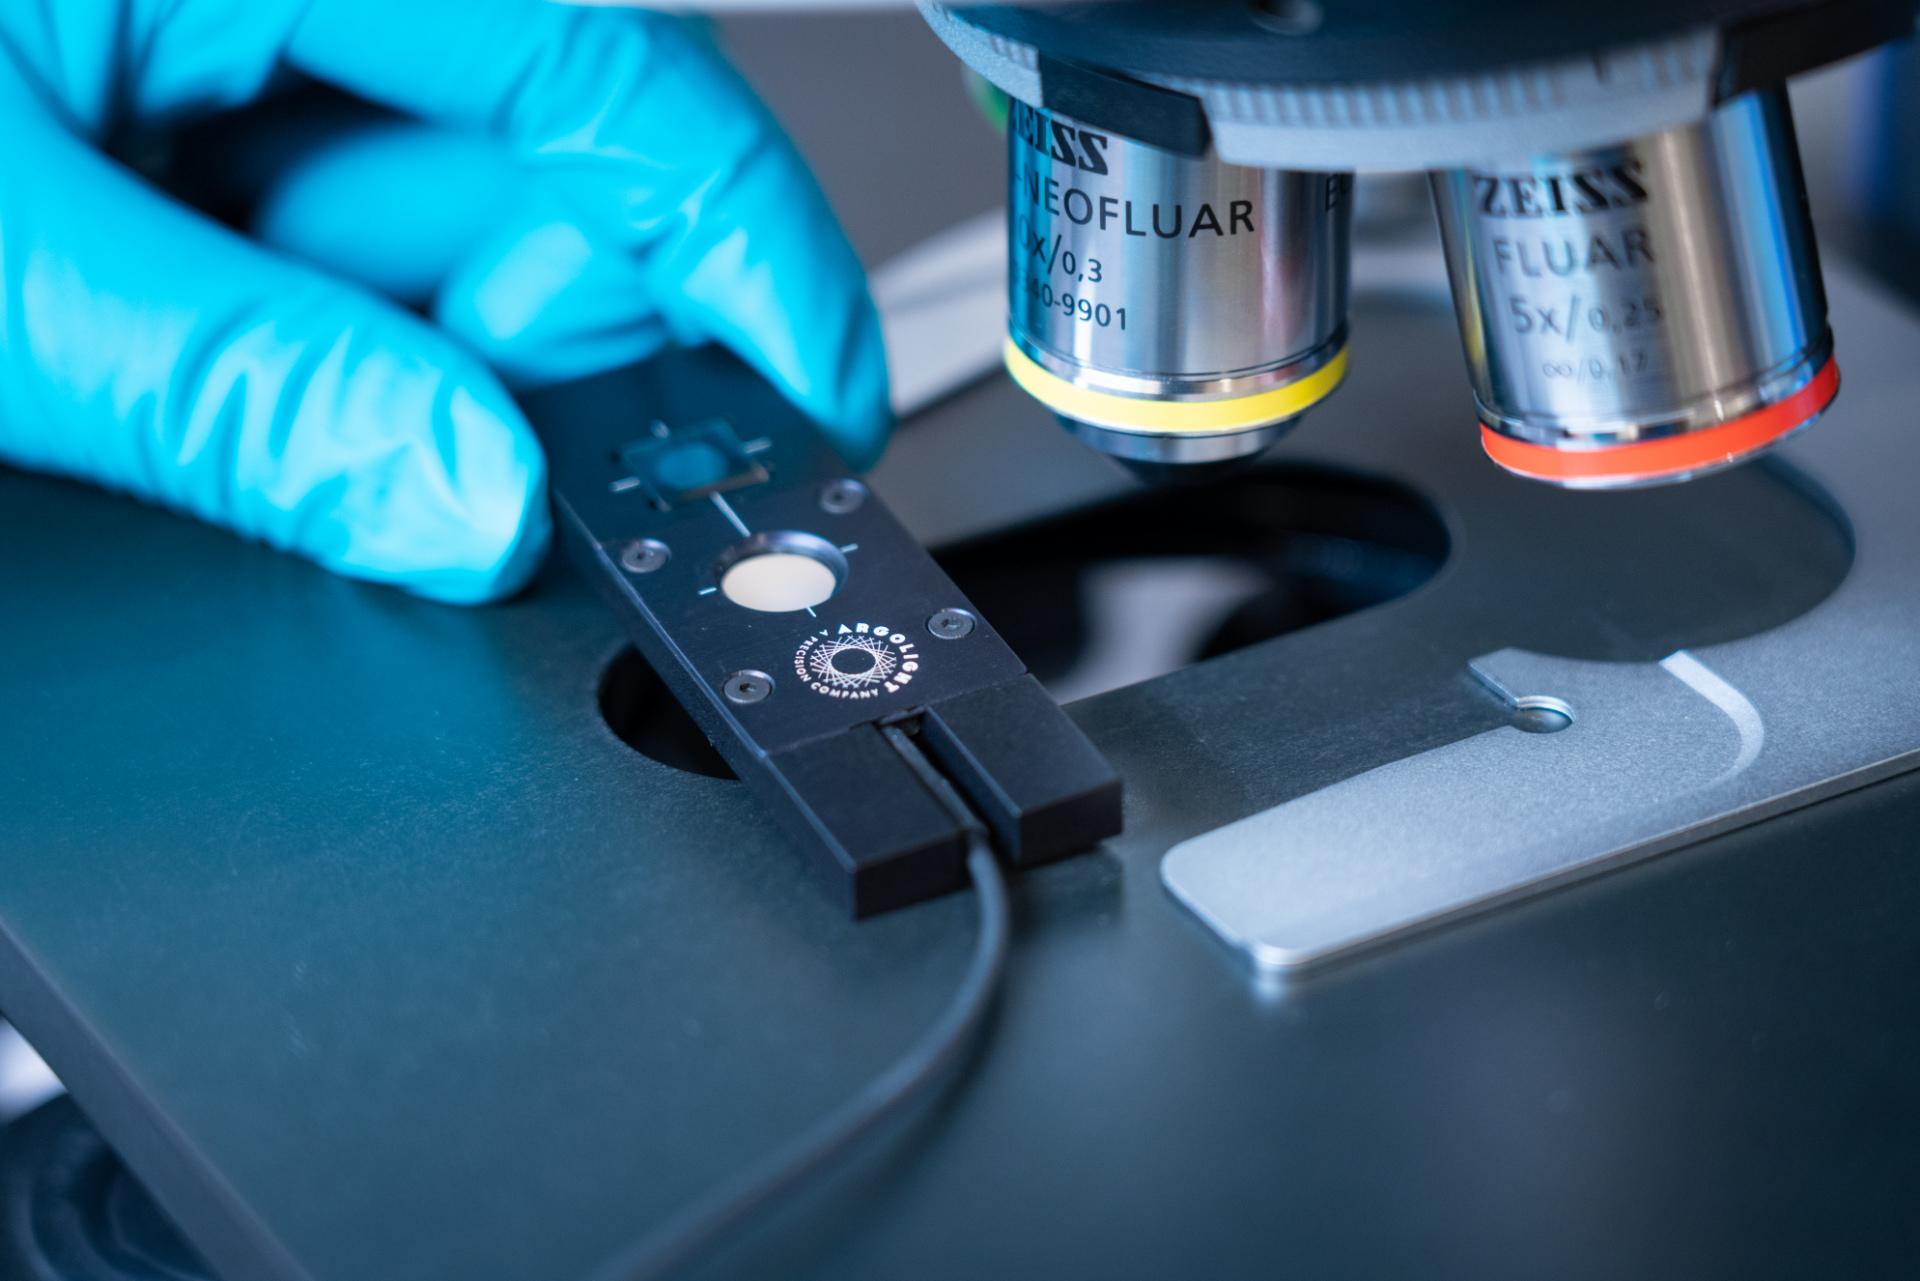 Photo of an Argolight Argo-POWER hm product under a microscope